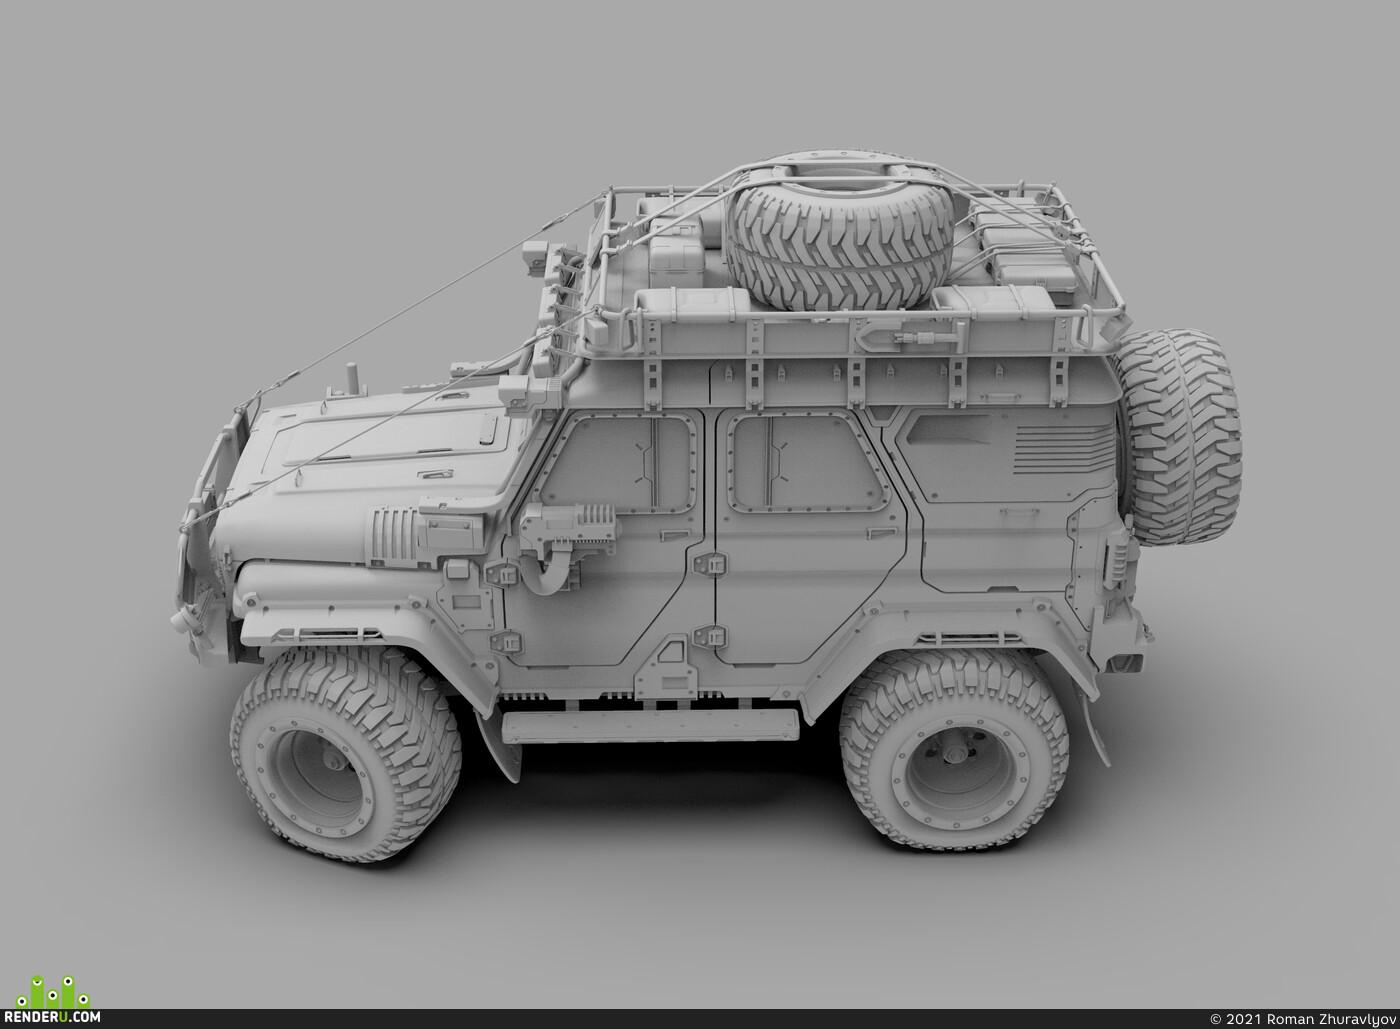 Cyberpunk 2077, Transport & Vehicles, RUSSIAN CYBERPUNK, ROMANZHURAVLYOV, gameart, hardsurfaces, cardesign, UAZ, hunter, automotive